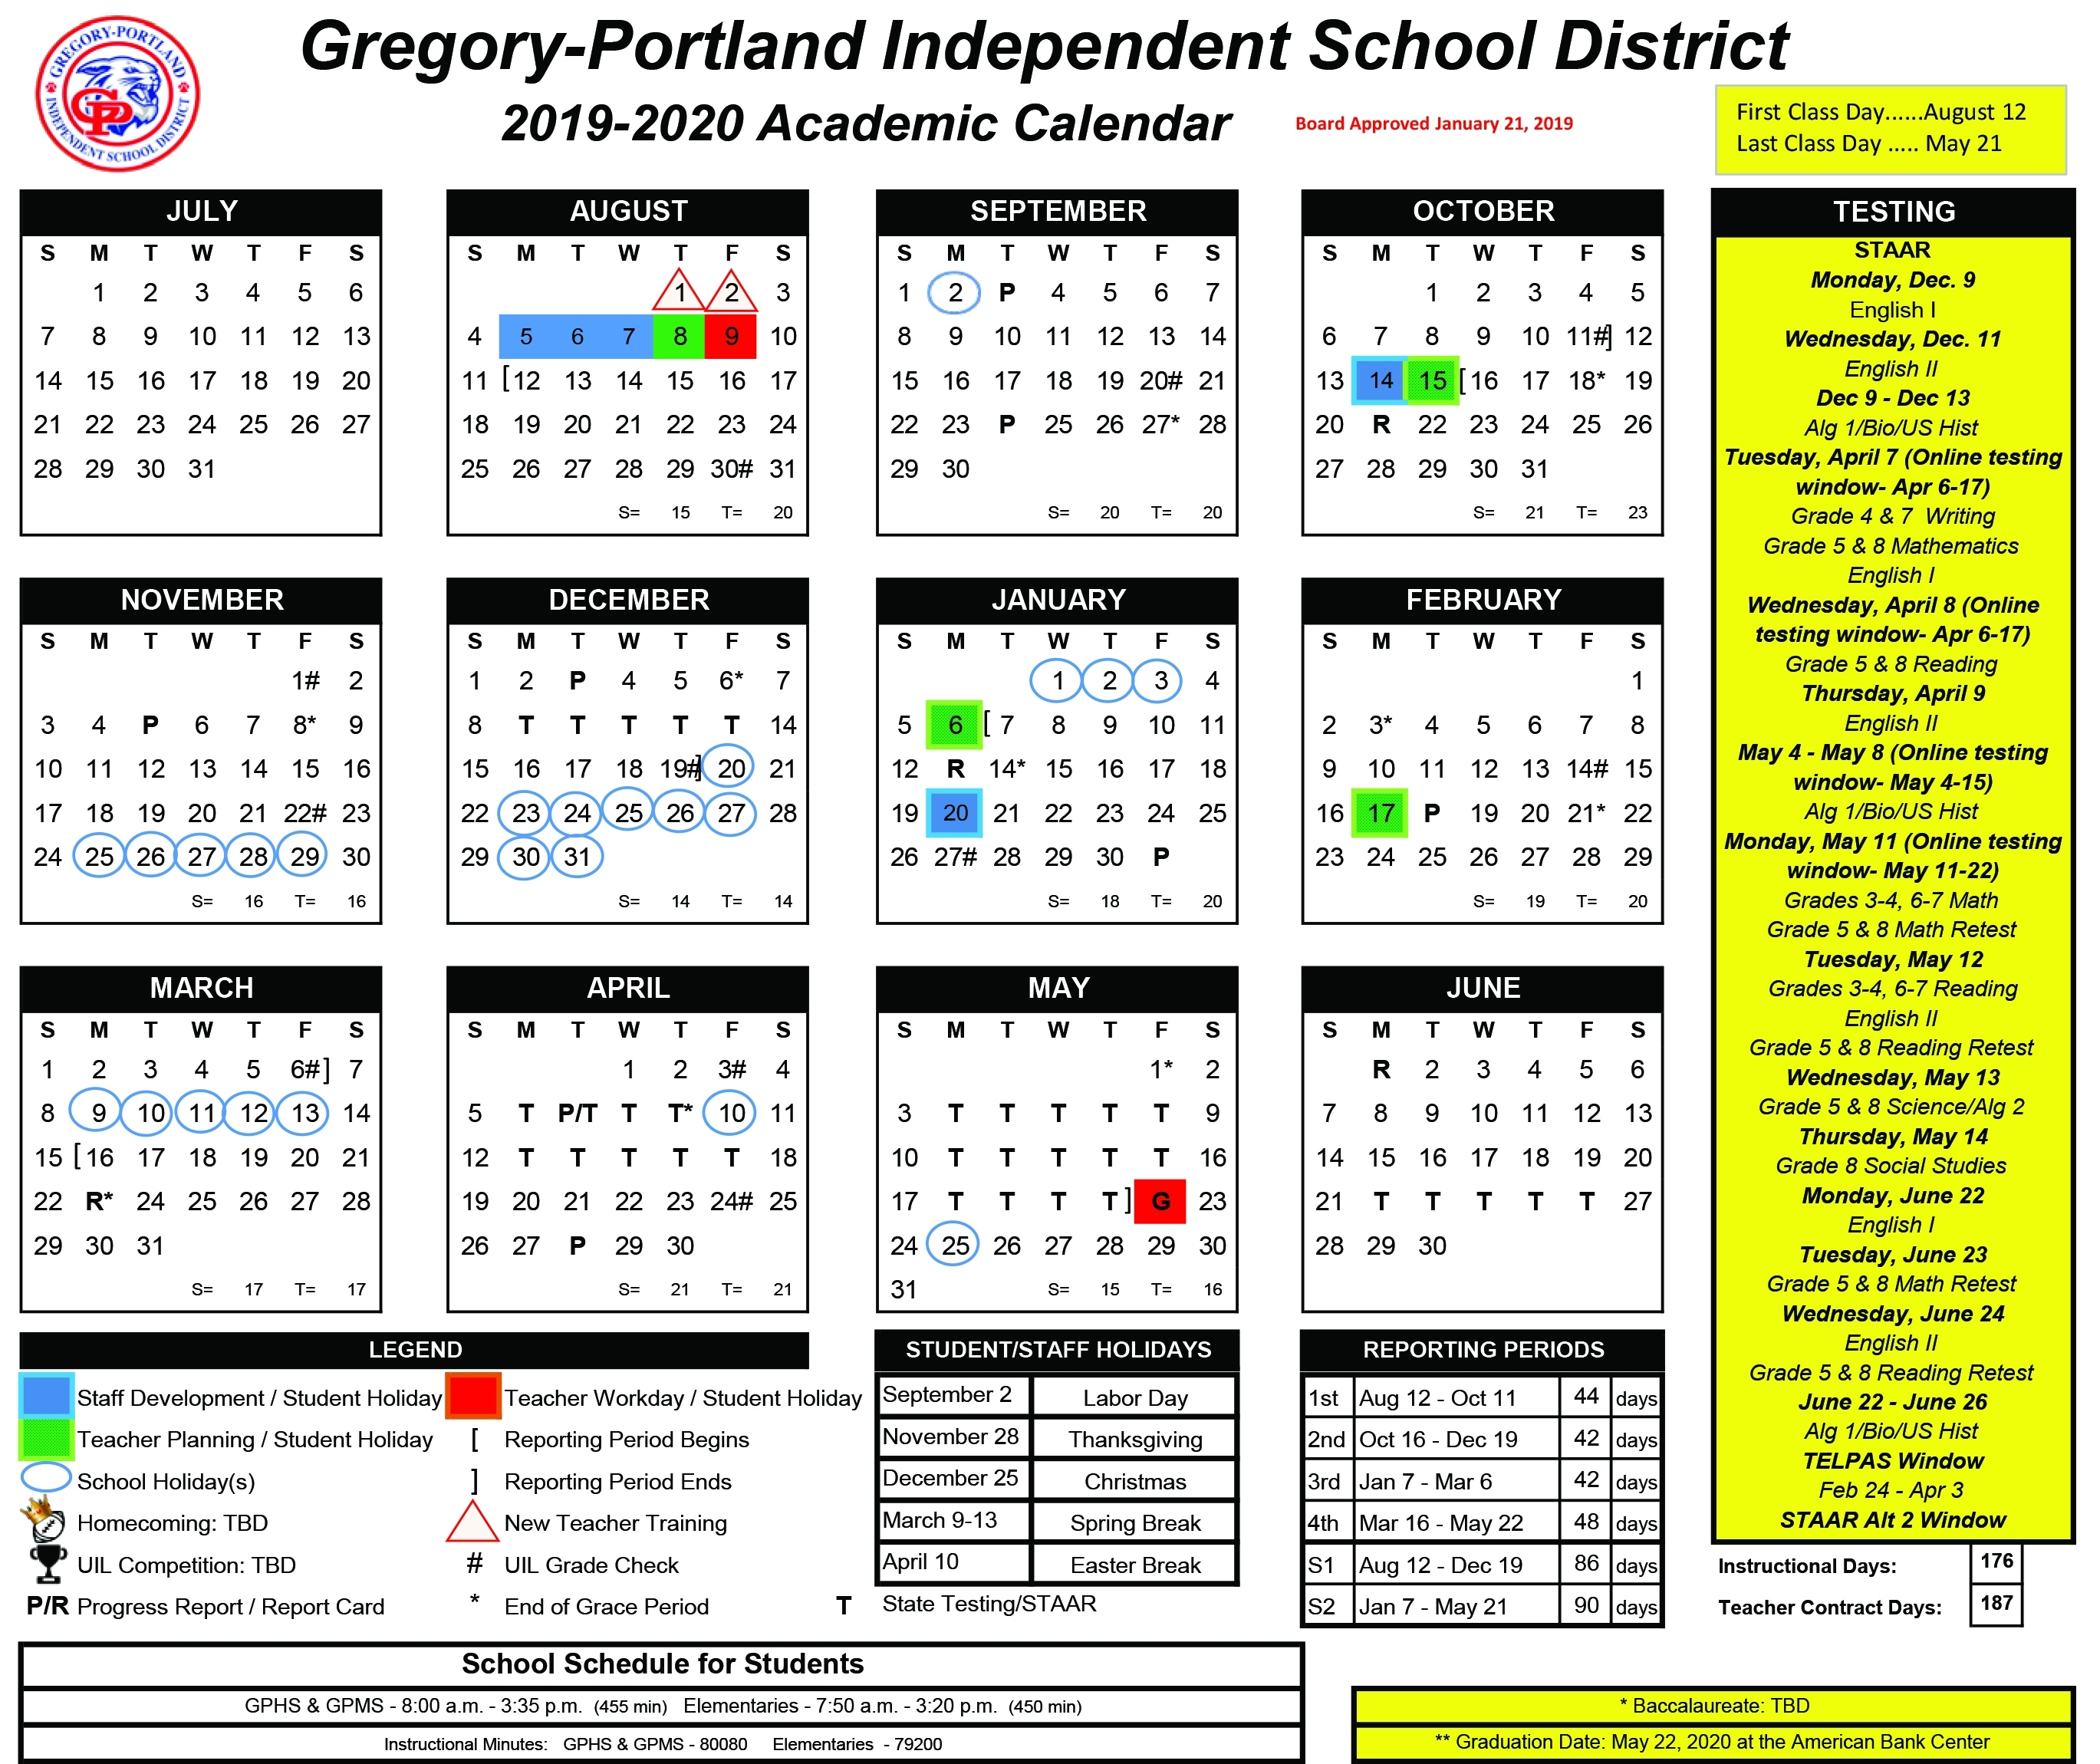 District Calendar, 2019-20 - Gregory-Portland Independent School regarding Stephen F Austin Calendar 2019 - 2020